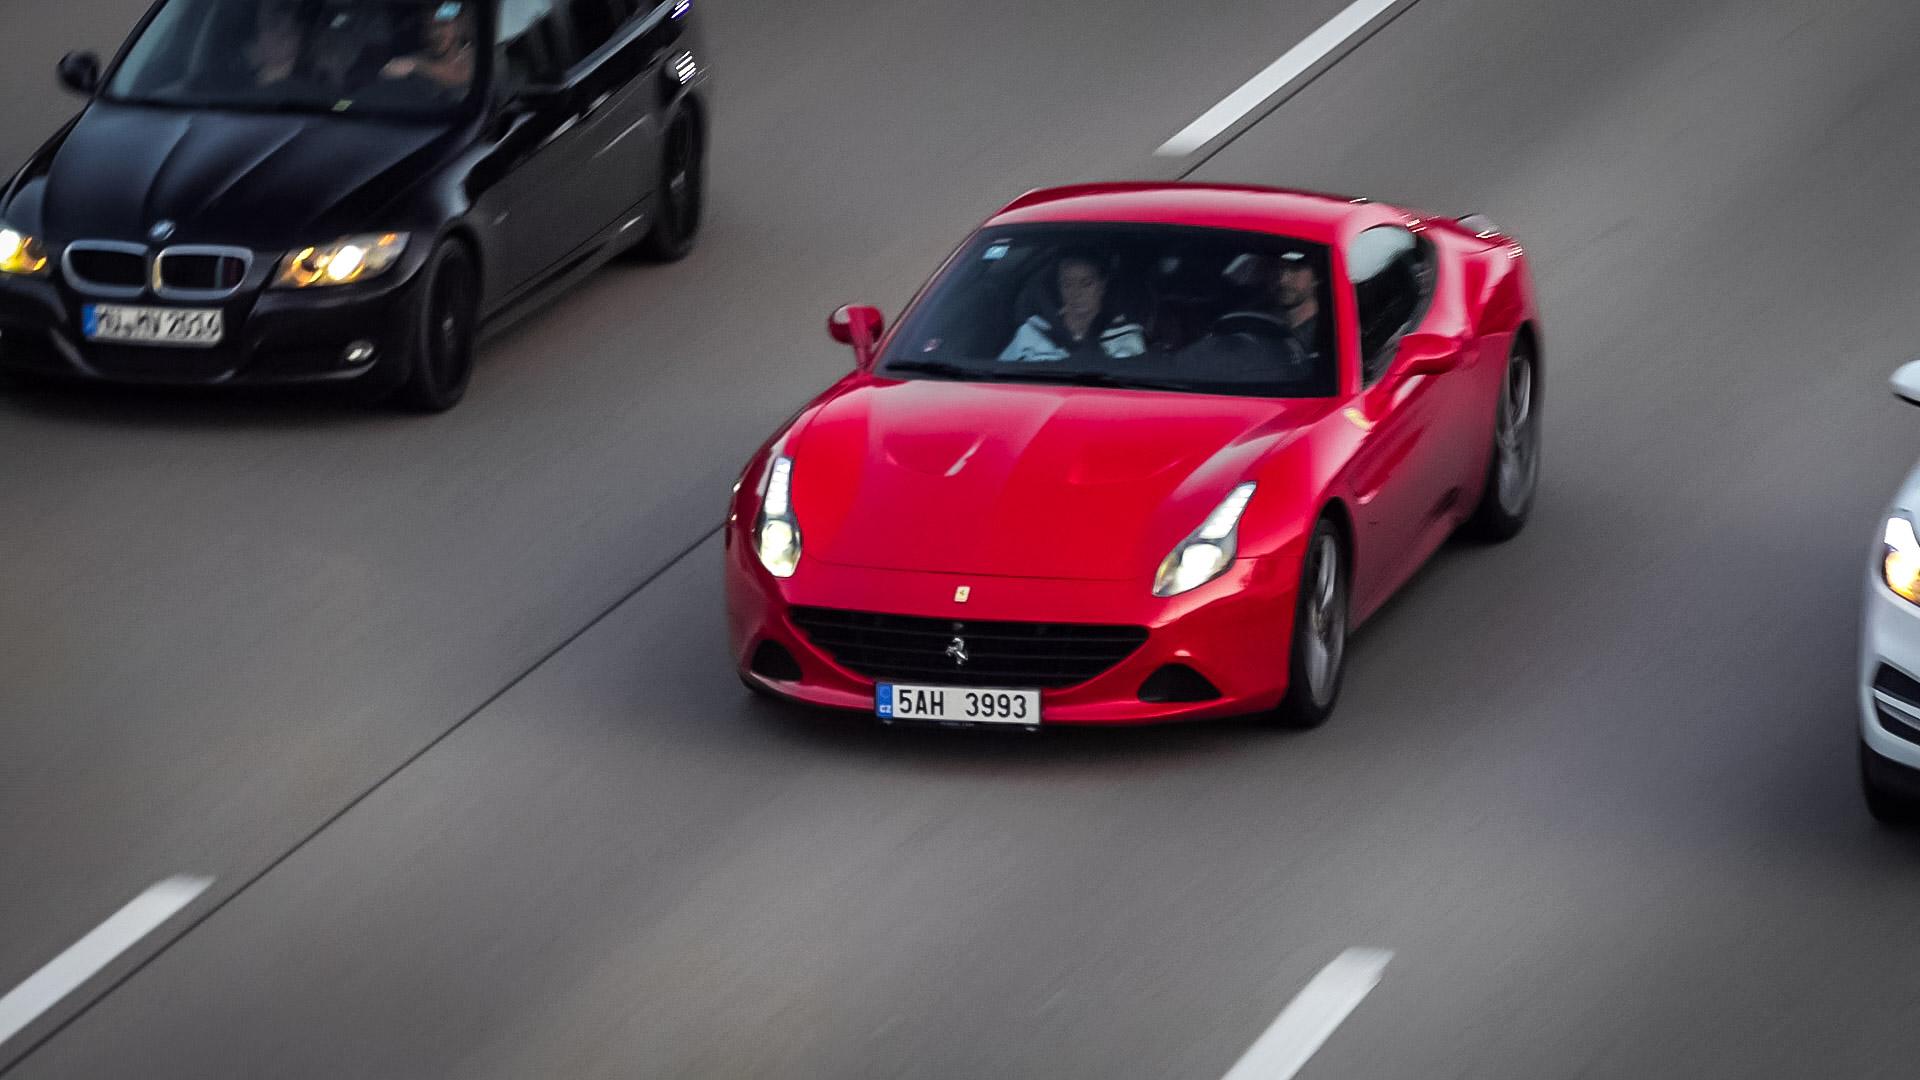 Ferrari California T - 5AH-3993 (CZ)